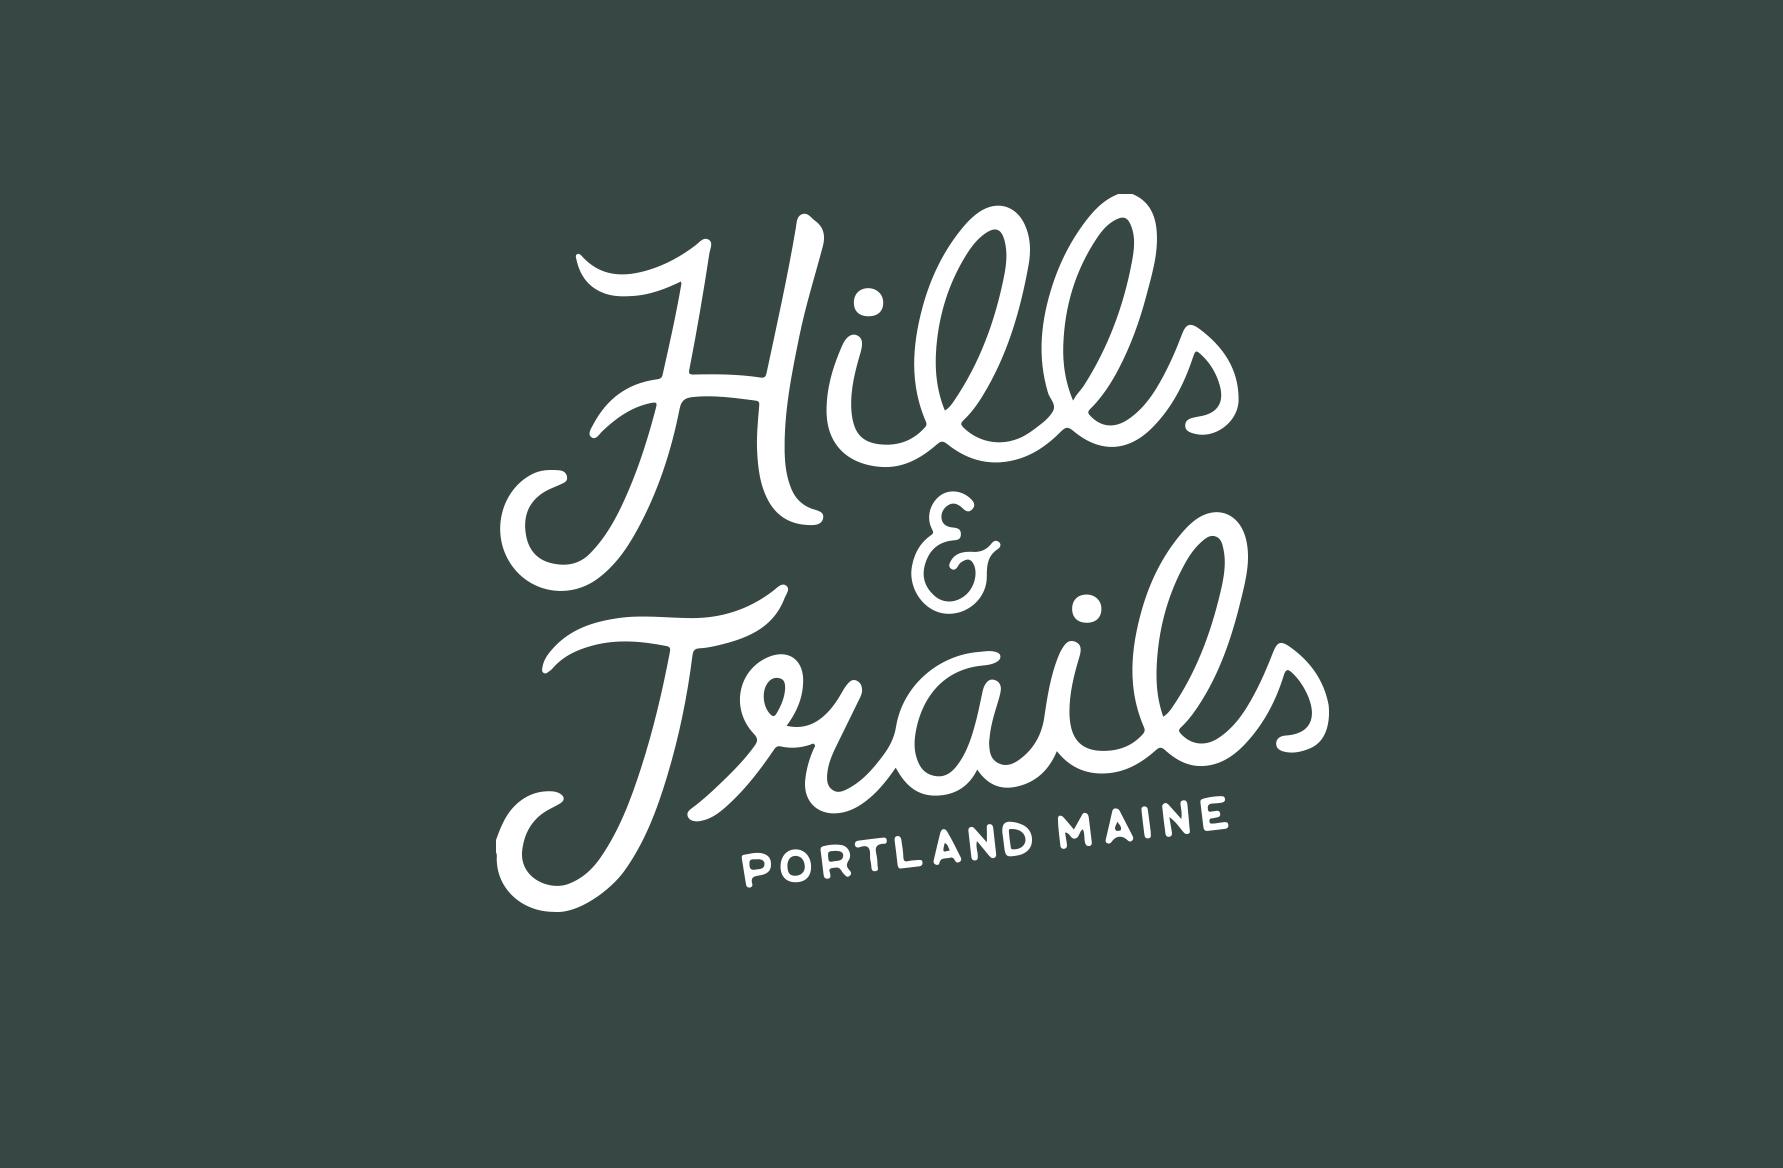 Hills and Trails